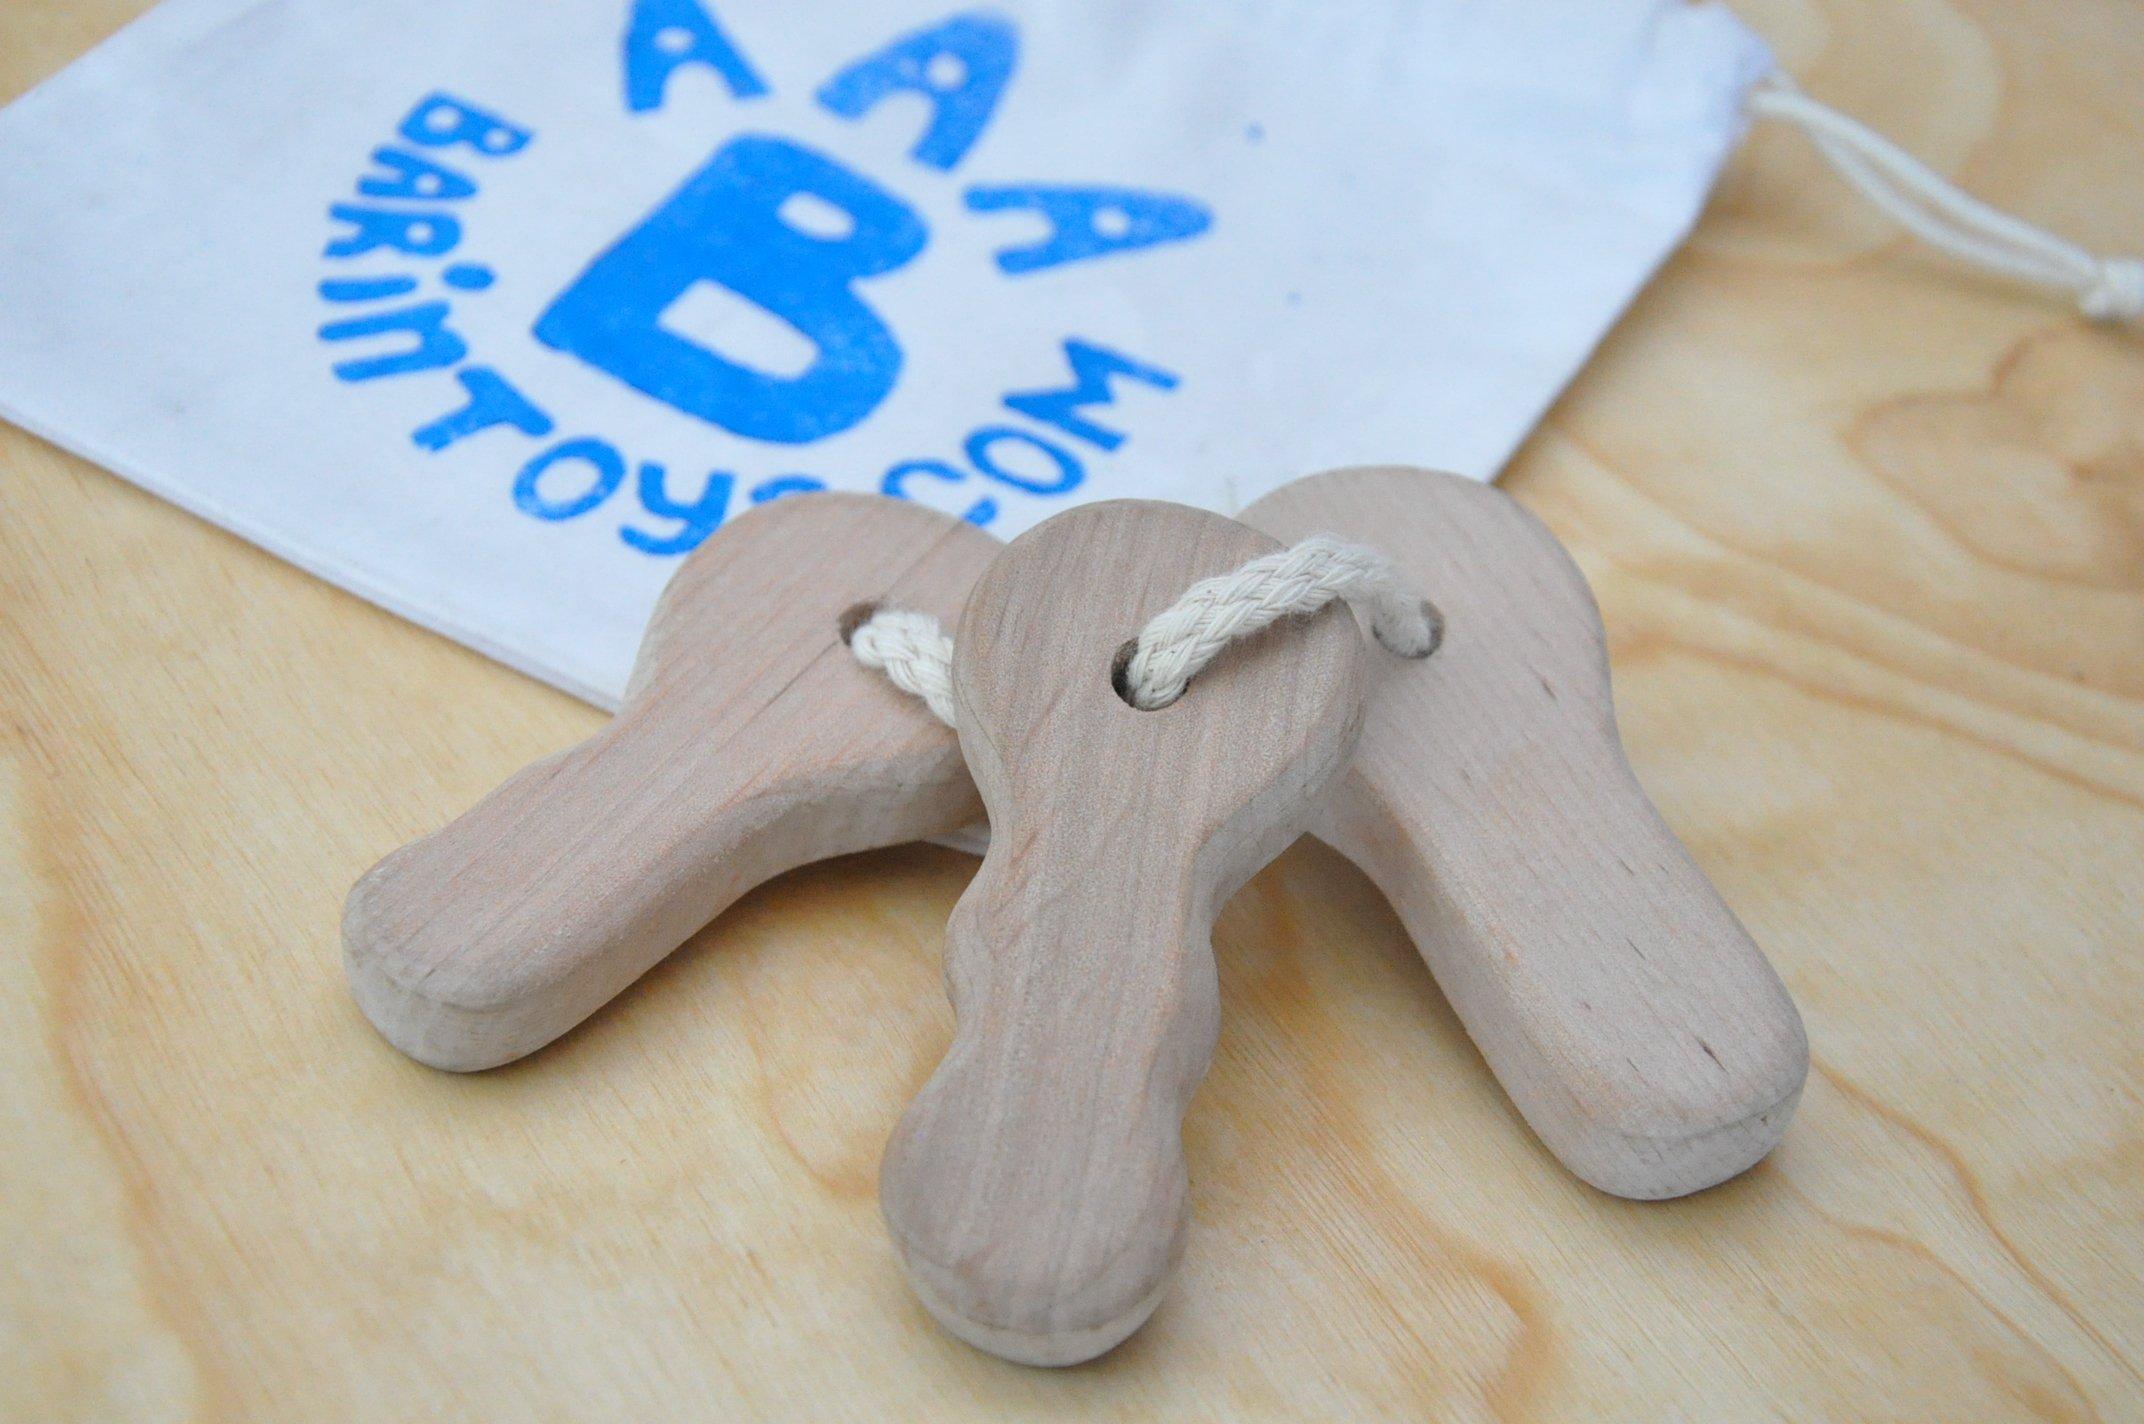 Barin Toys Baby Keys Keepsake Rattle First Keys Baby Toy